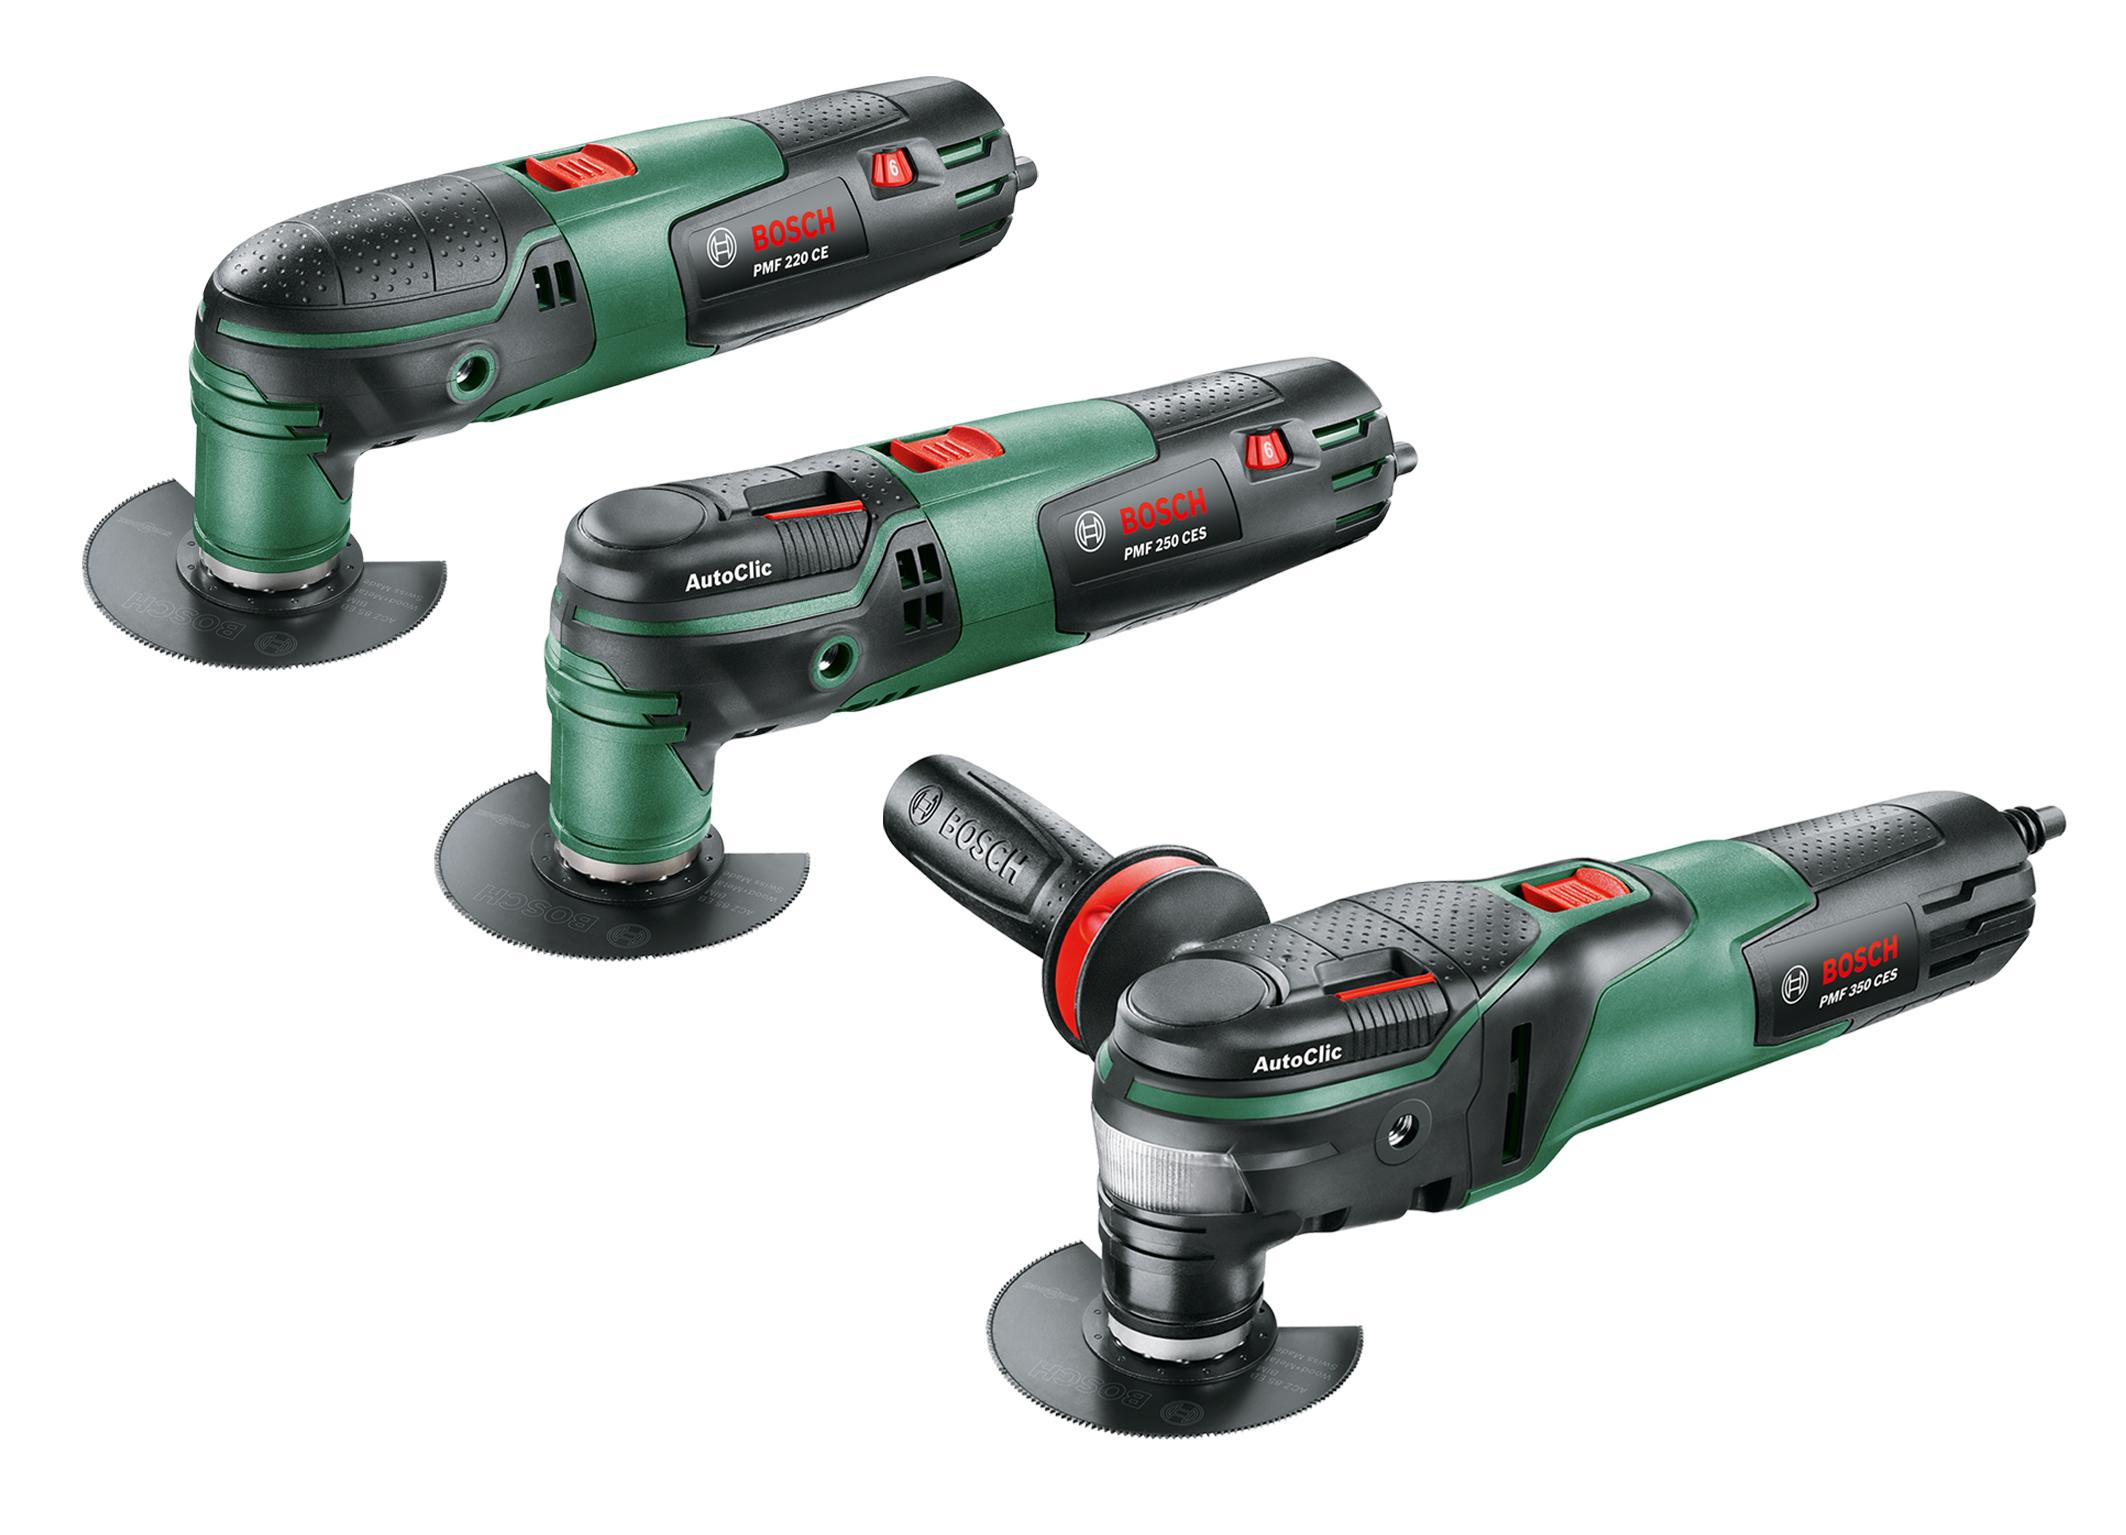 Verwonderend New multi-tools by Bosch - Bosch Media Service MU-25